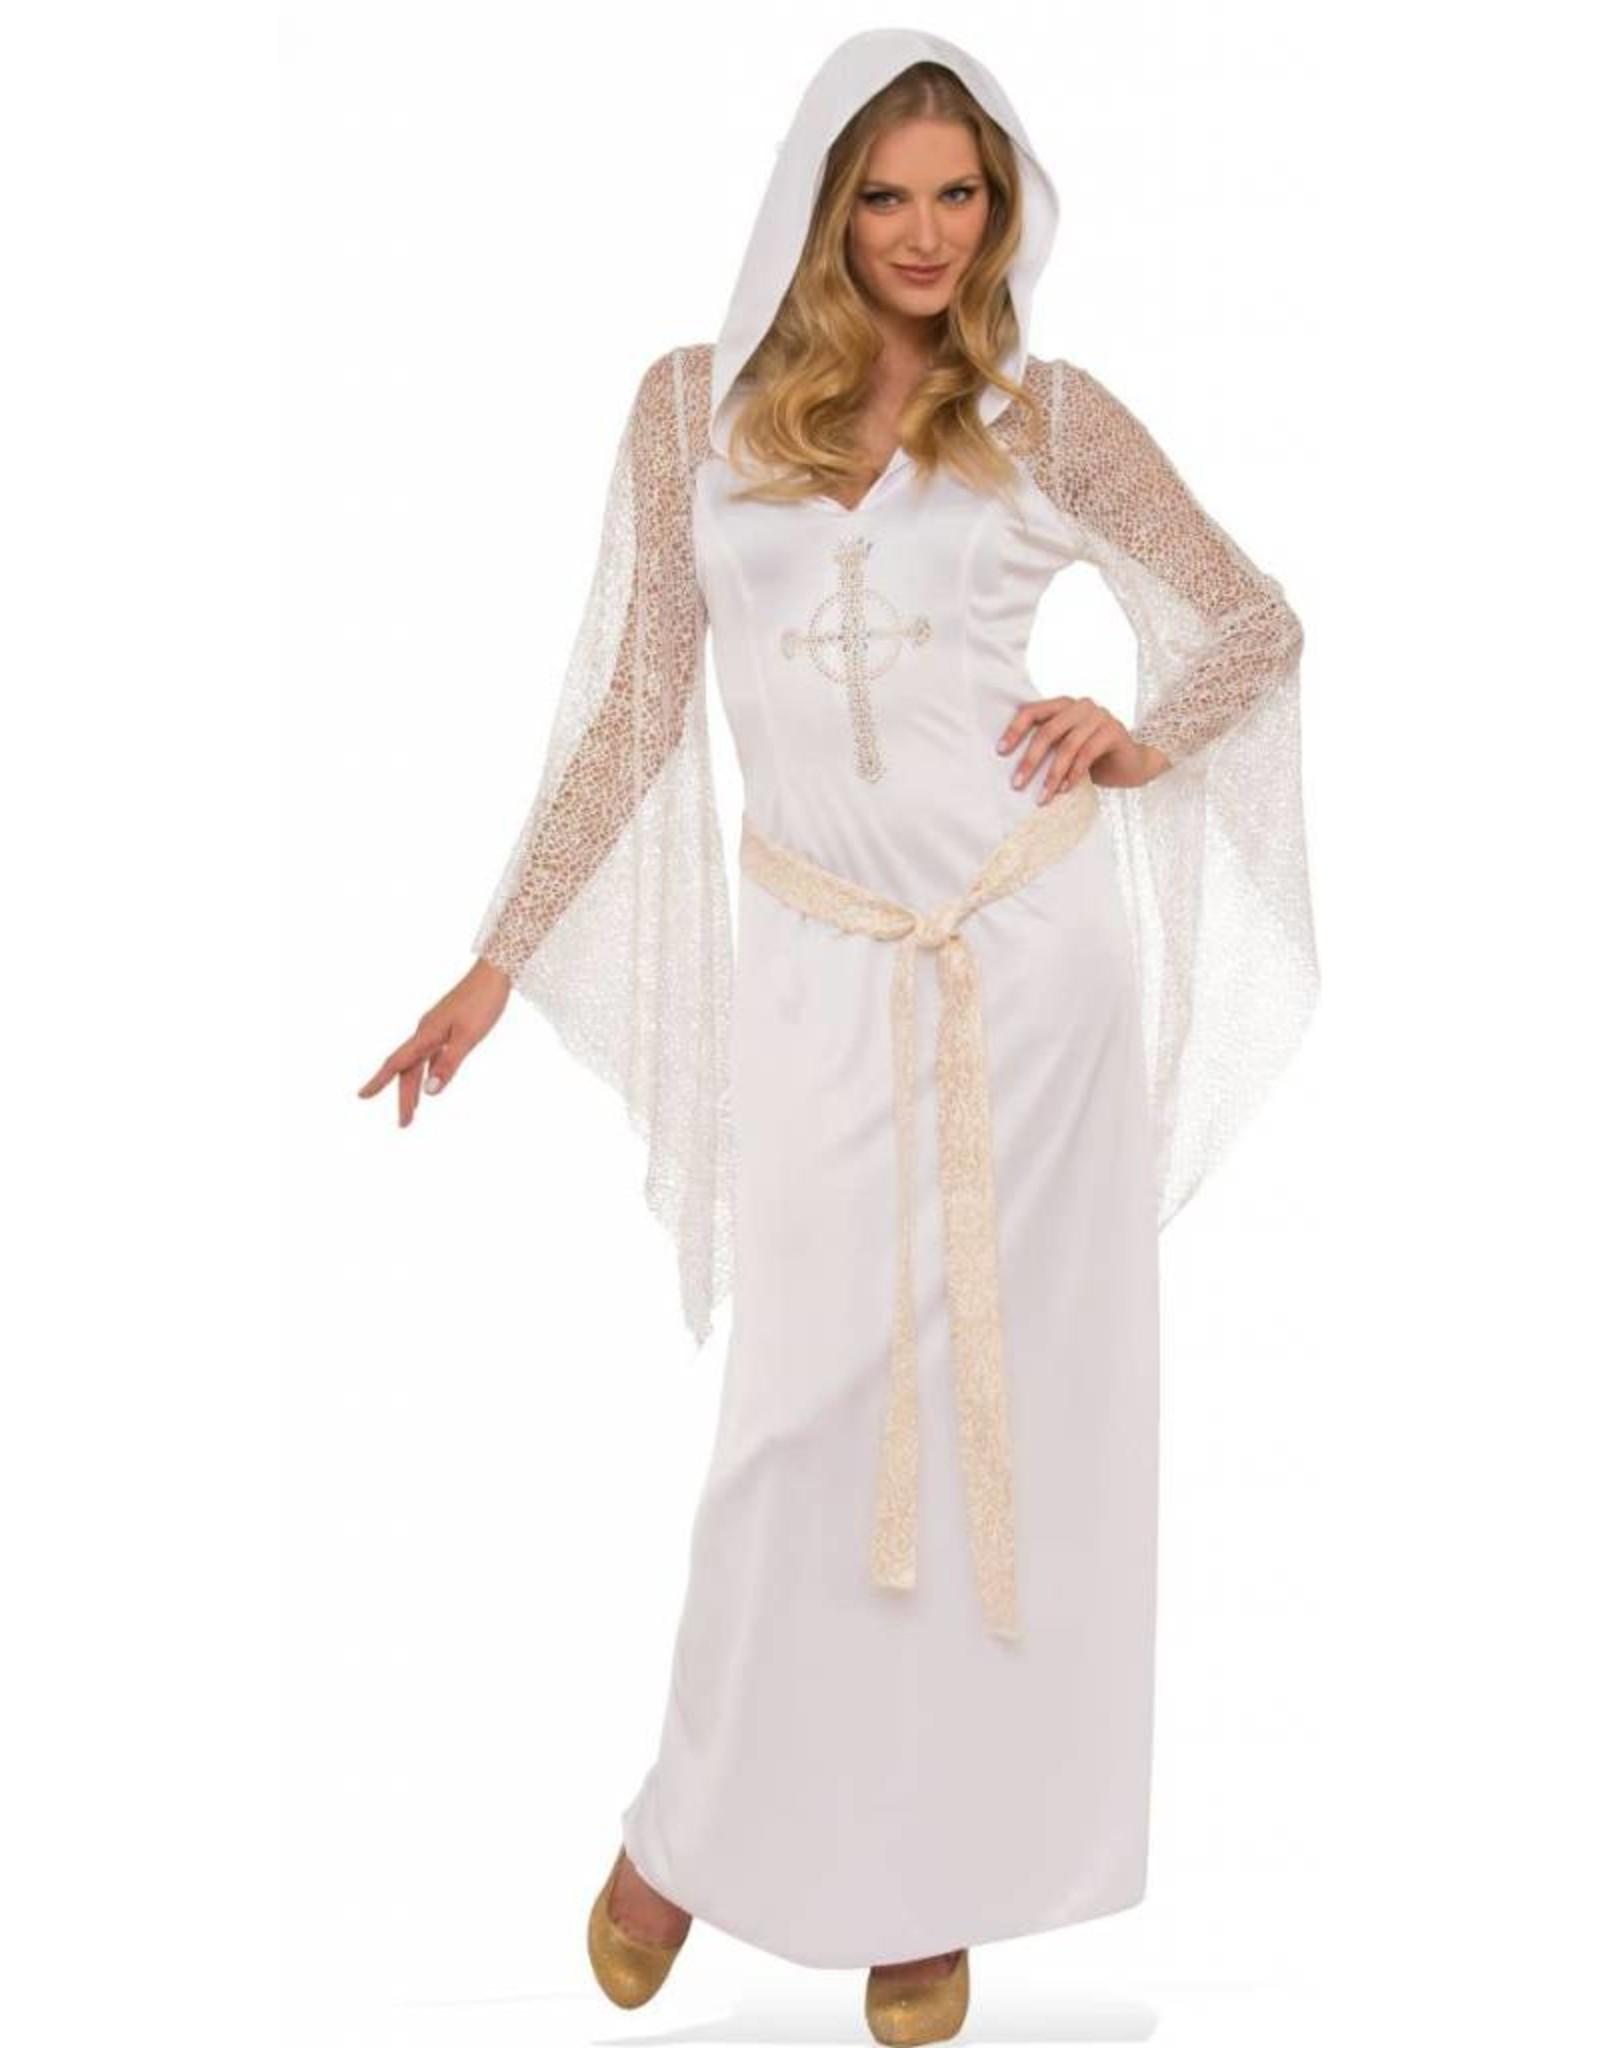 Rubies Costume White Priestess Dress